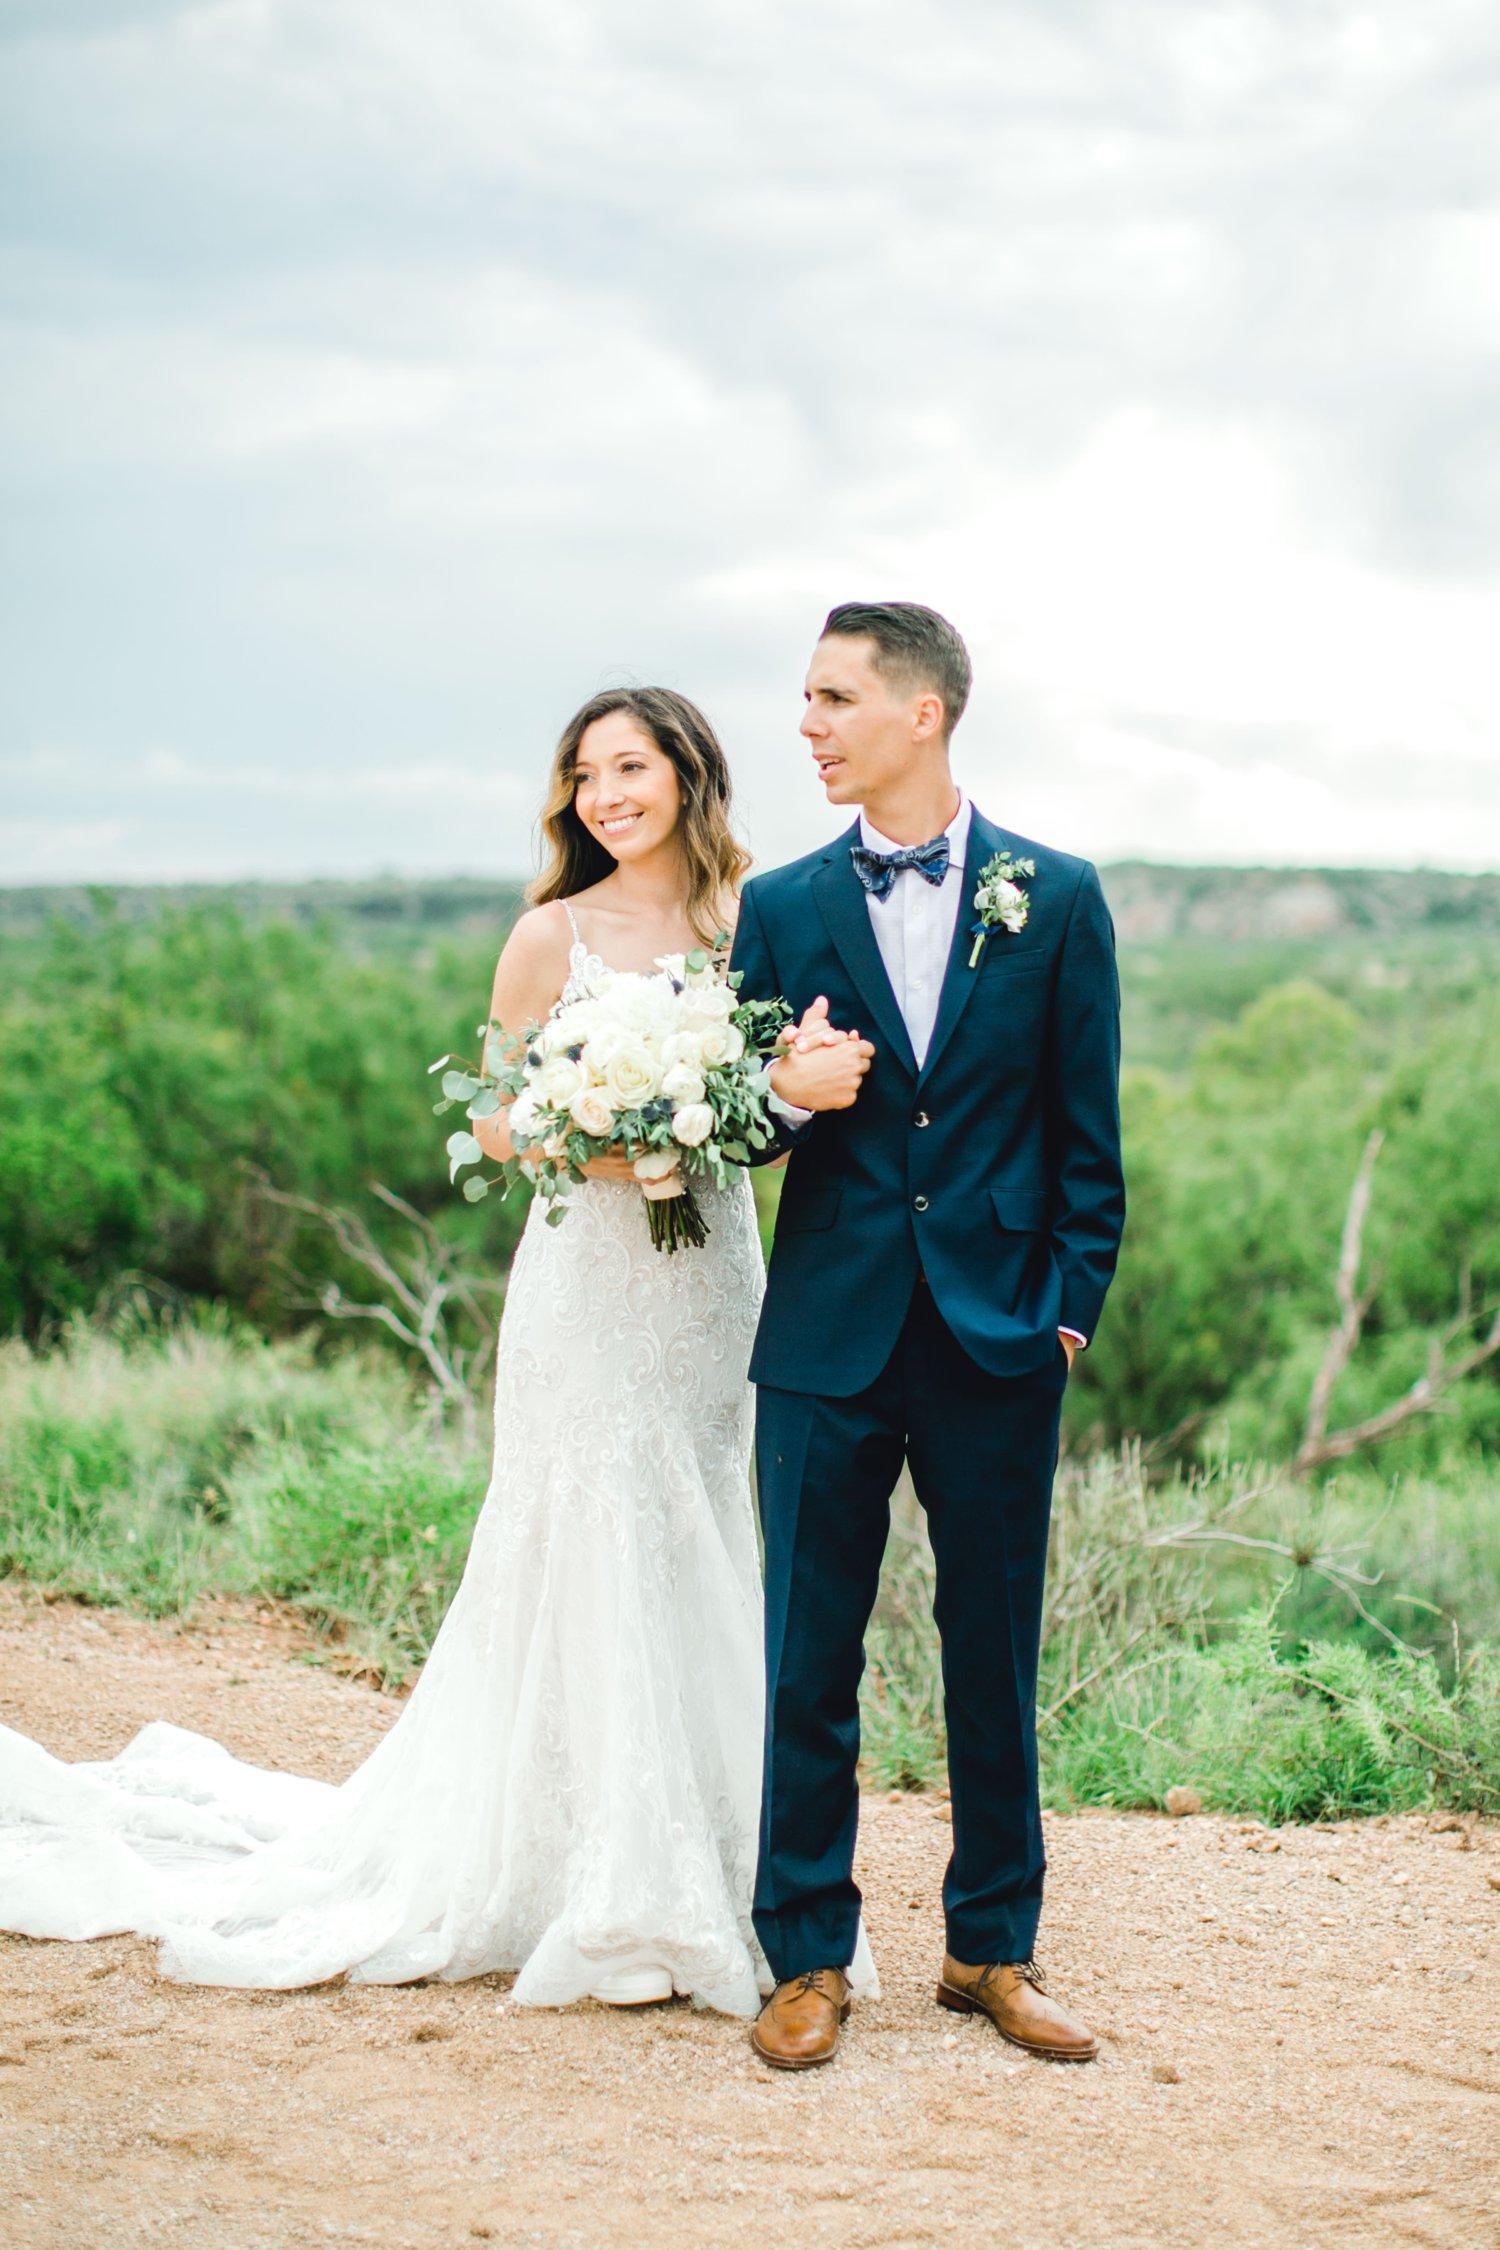 Ashley_John_English_Elegant_Texas_Wedding_Outdoors_Ranch_Caprock_Winery_ALLEEJ_0052.jpg